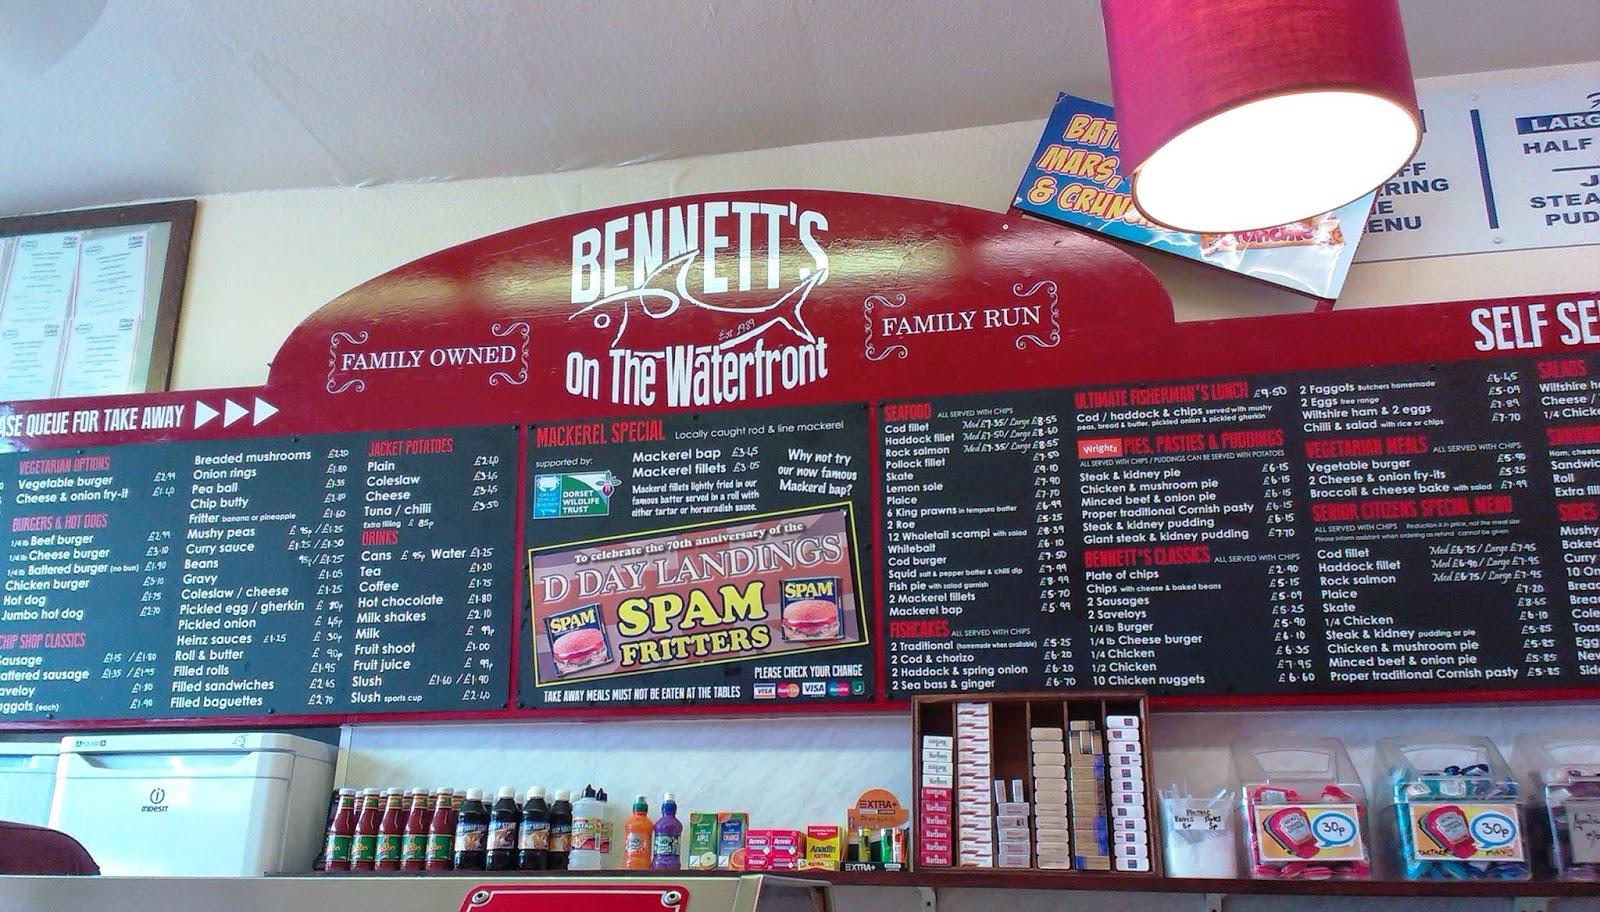 Weymouth Bennett's on the Waterfront Menu